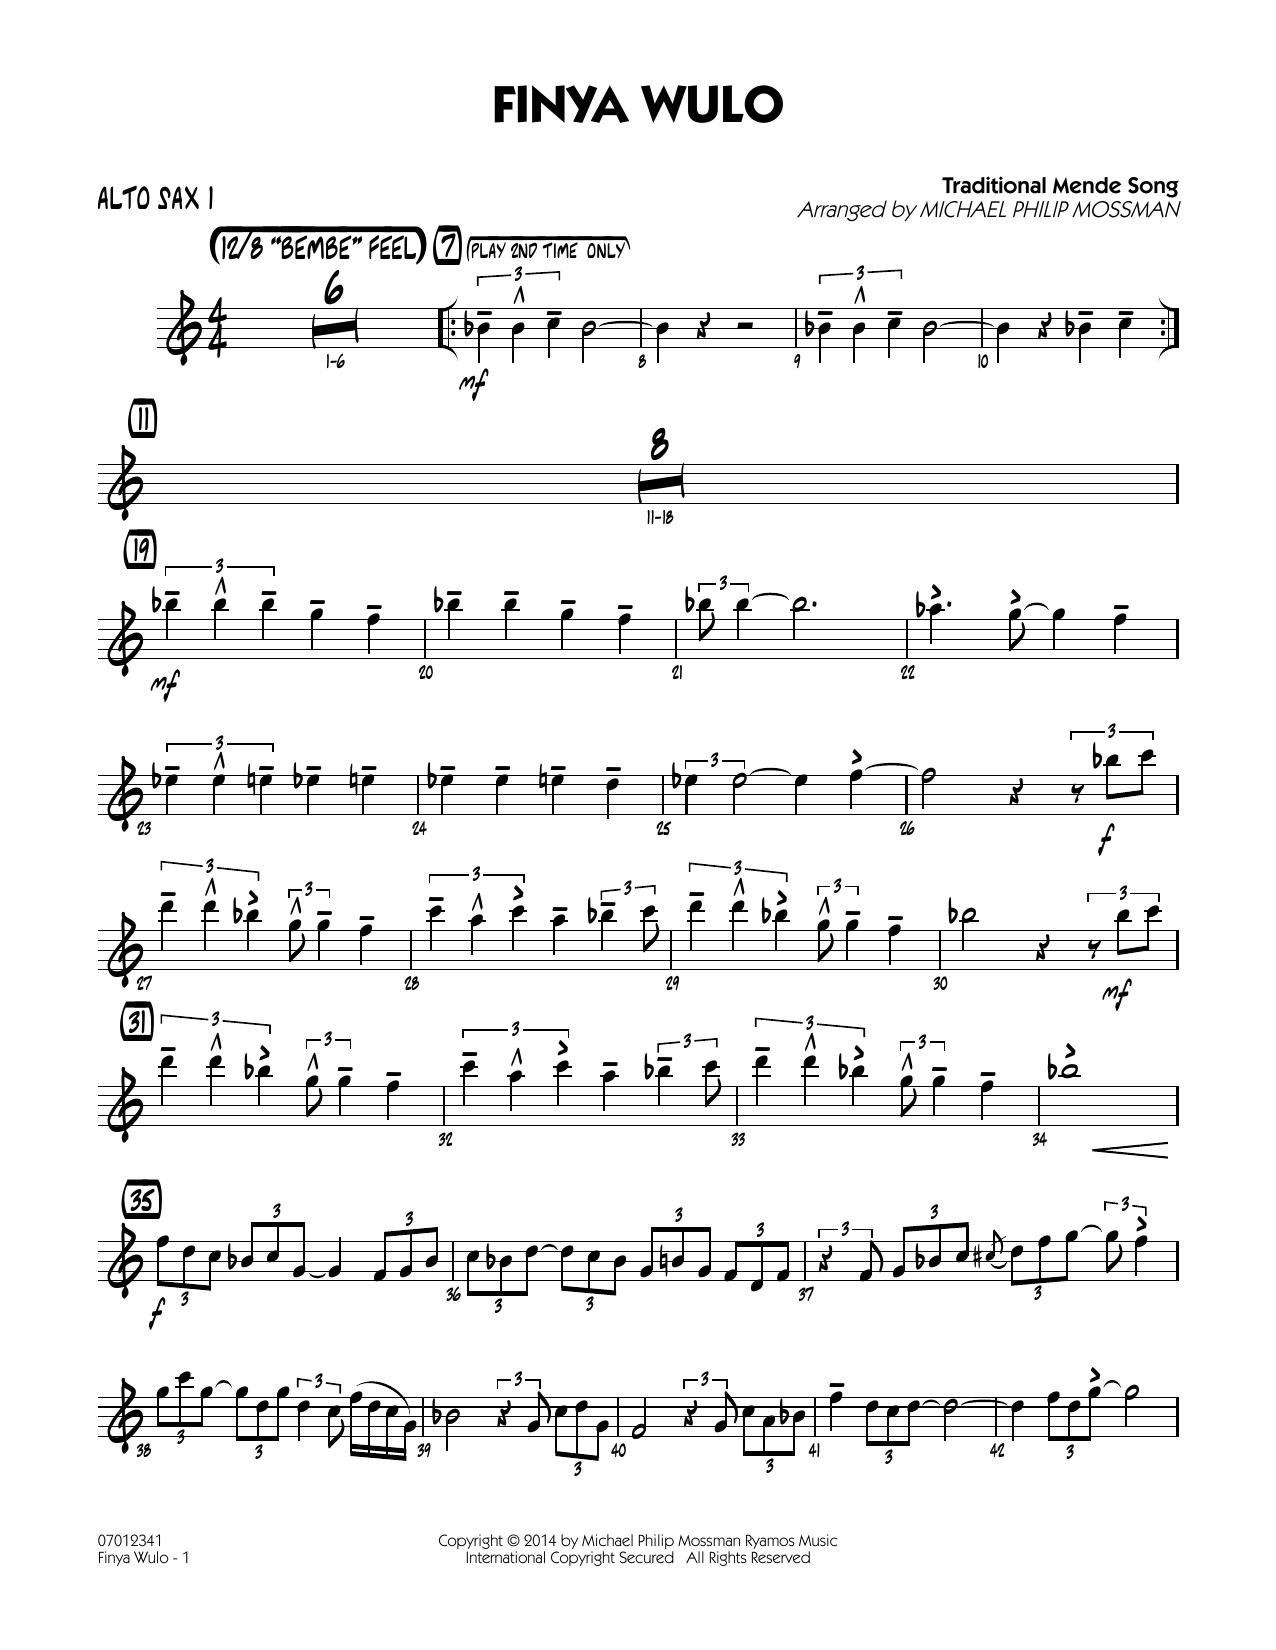 Finya Wulo - Alto Sax 1 (Jazz Ensemble)